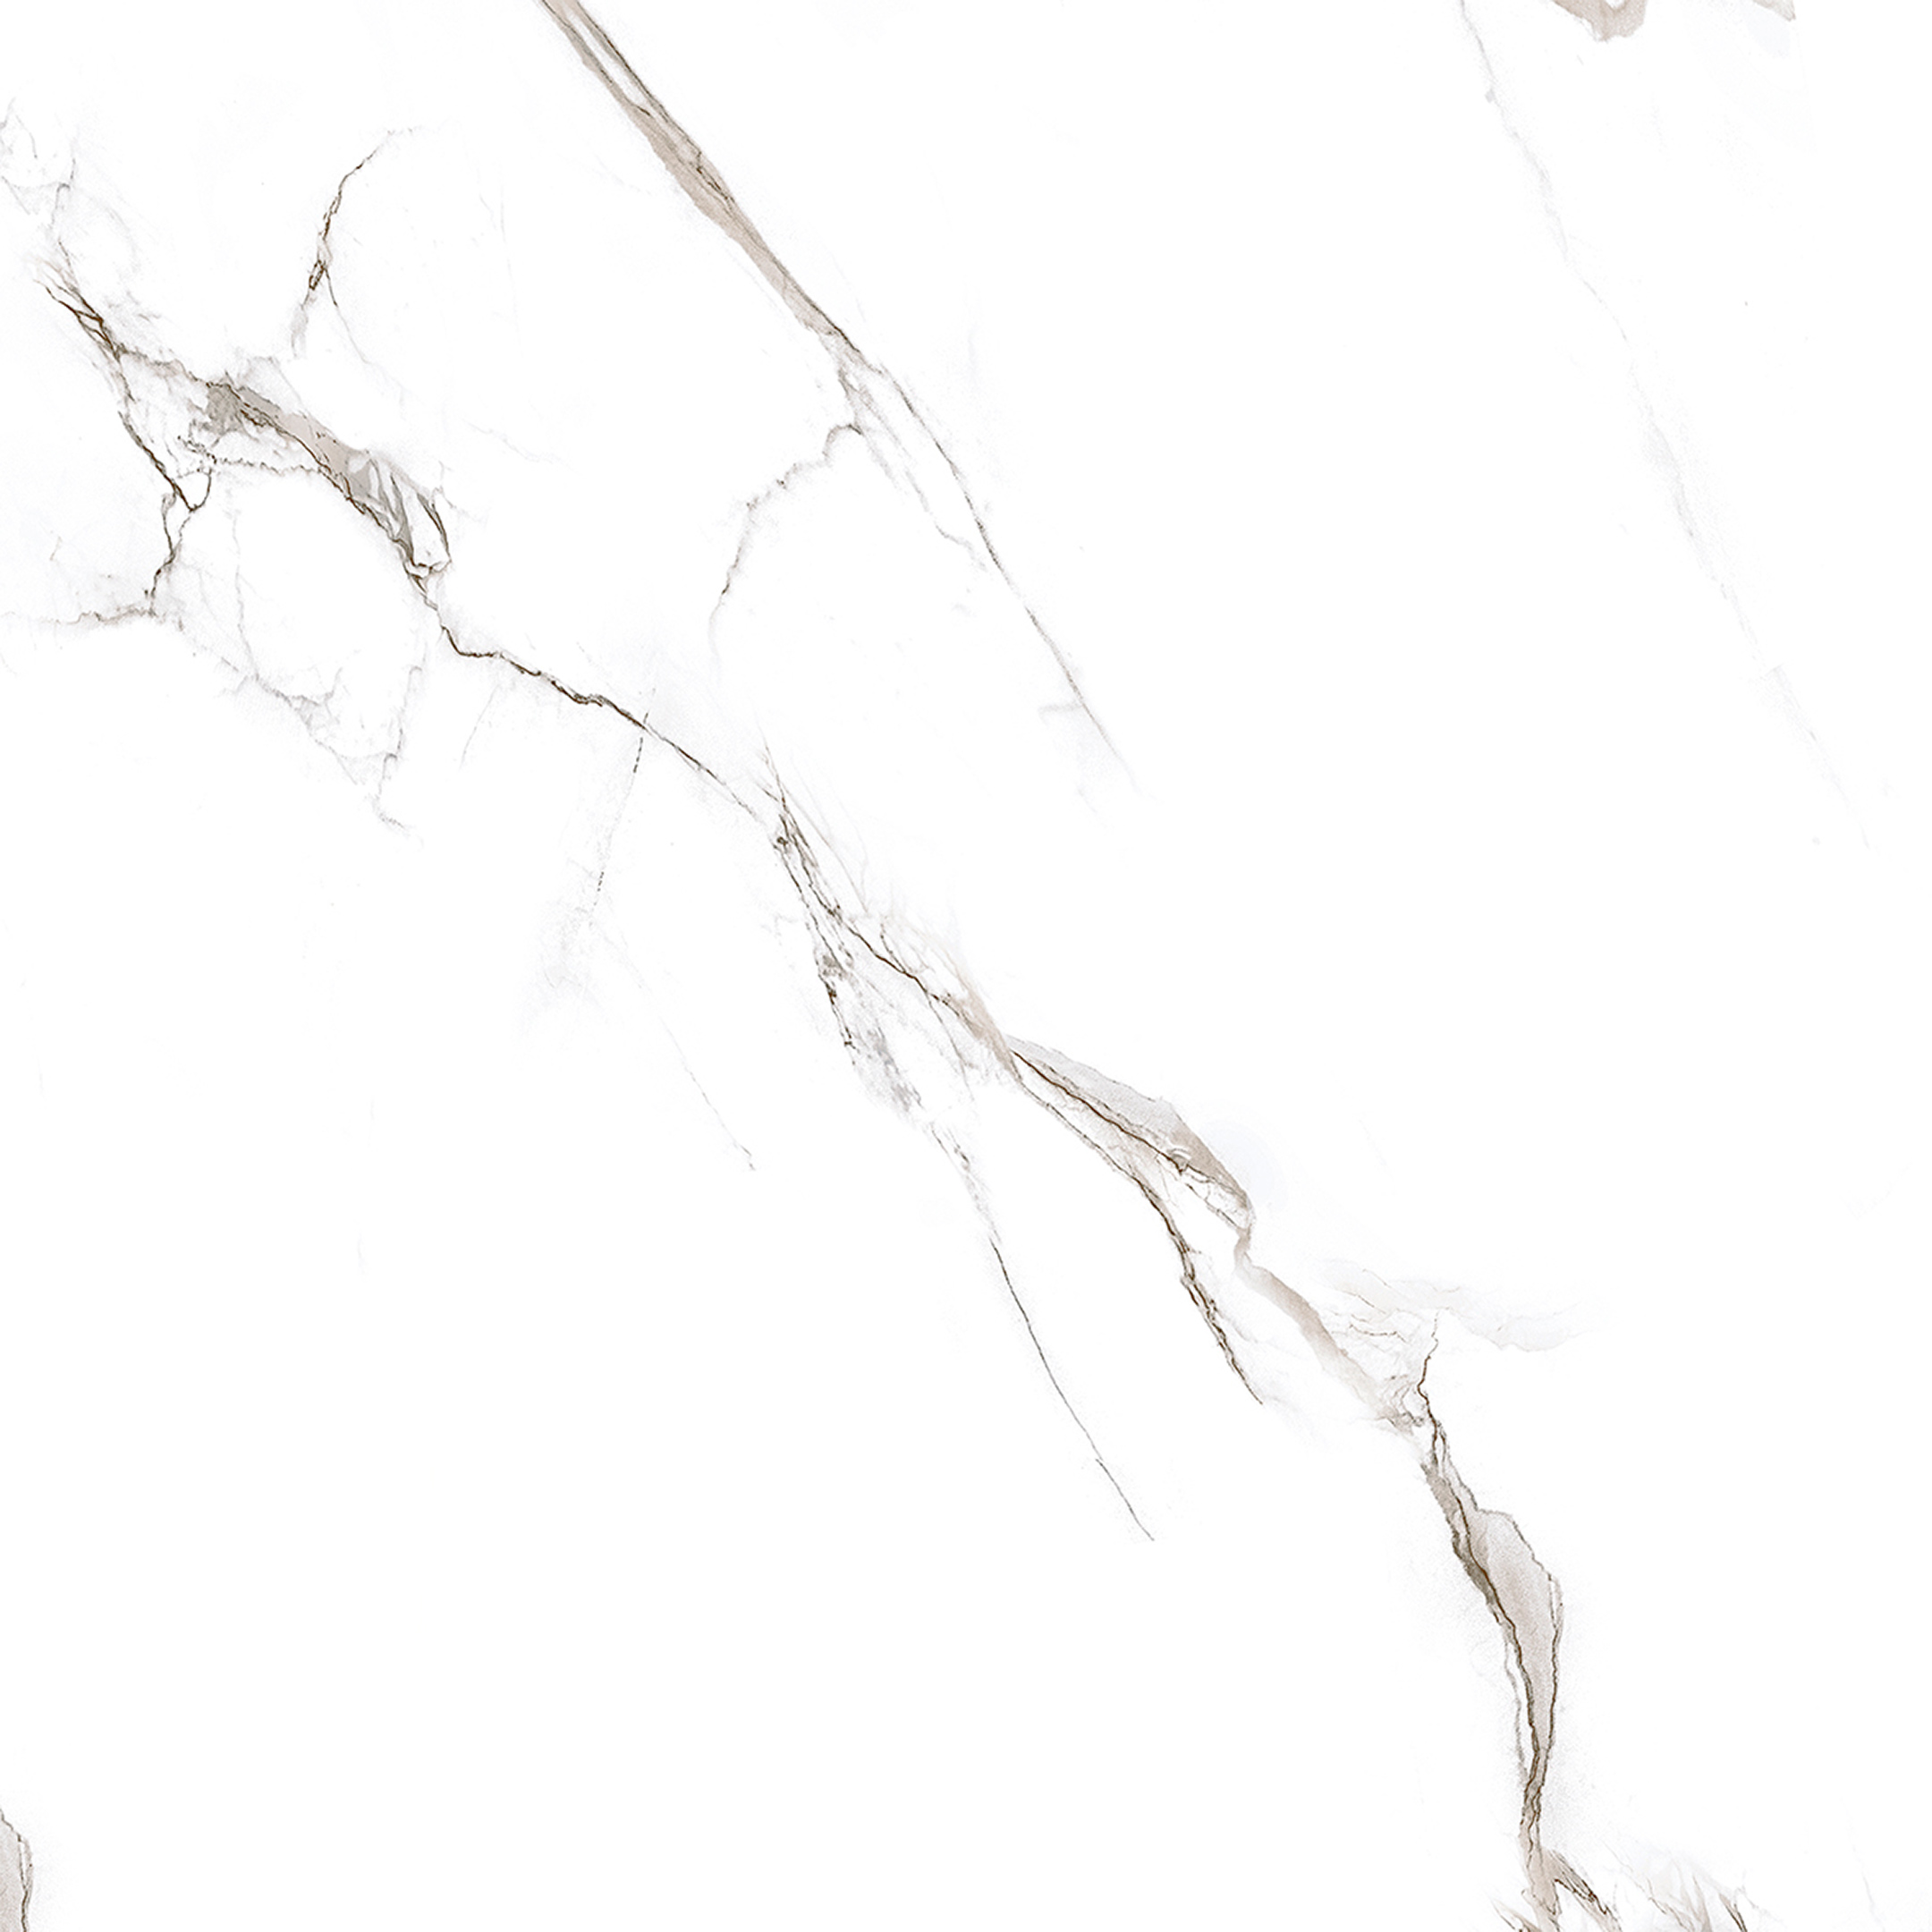 Керамогранит GRASARO Classic Marble белый глянцевый 400х400х8 мм (10 шт.) grasaro marble classic snow white gt 270 d02 40x40